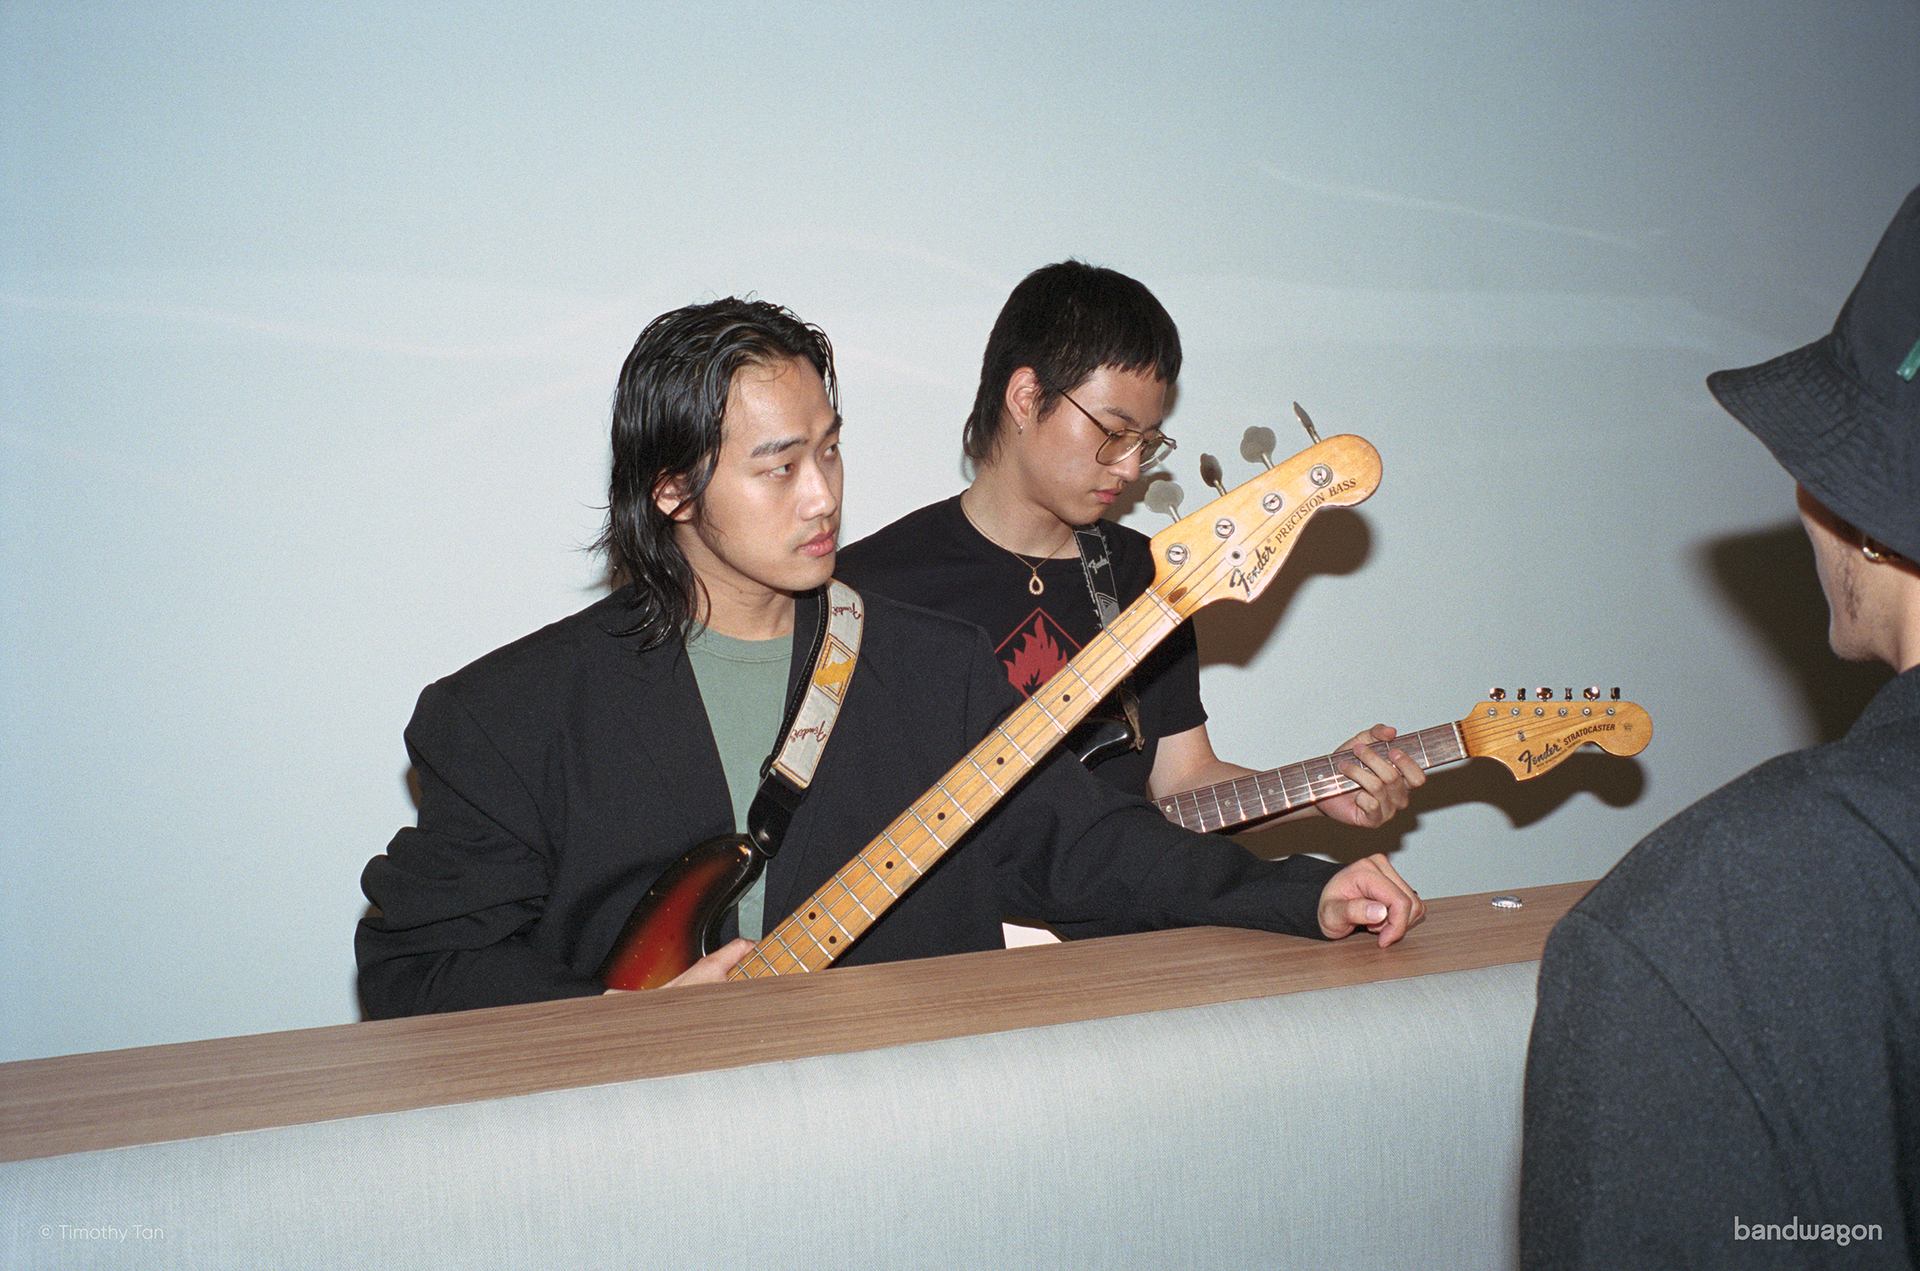 hyukoh south korea indie rock band k-pop